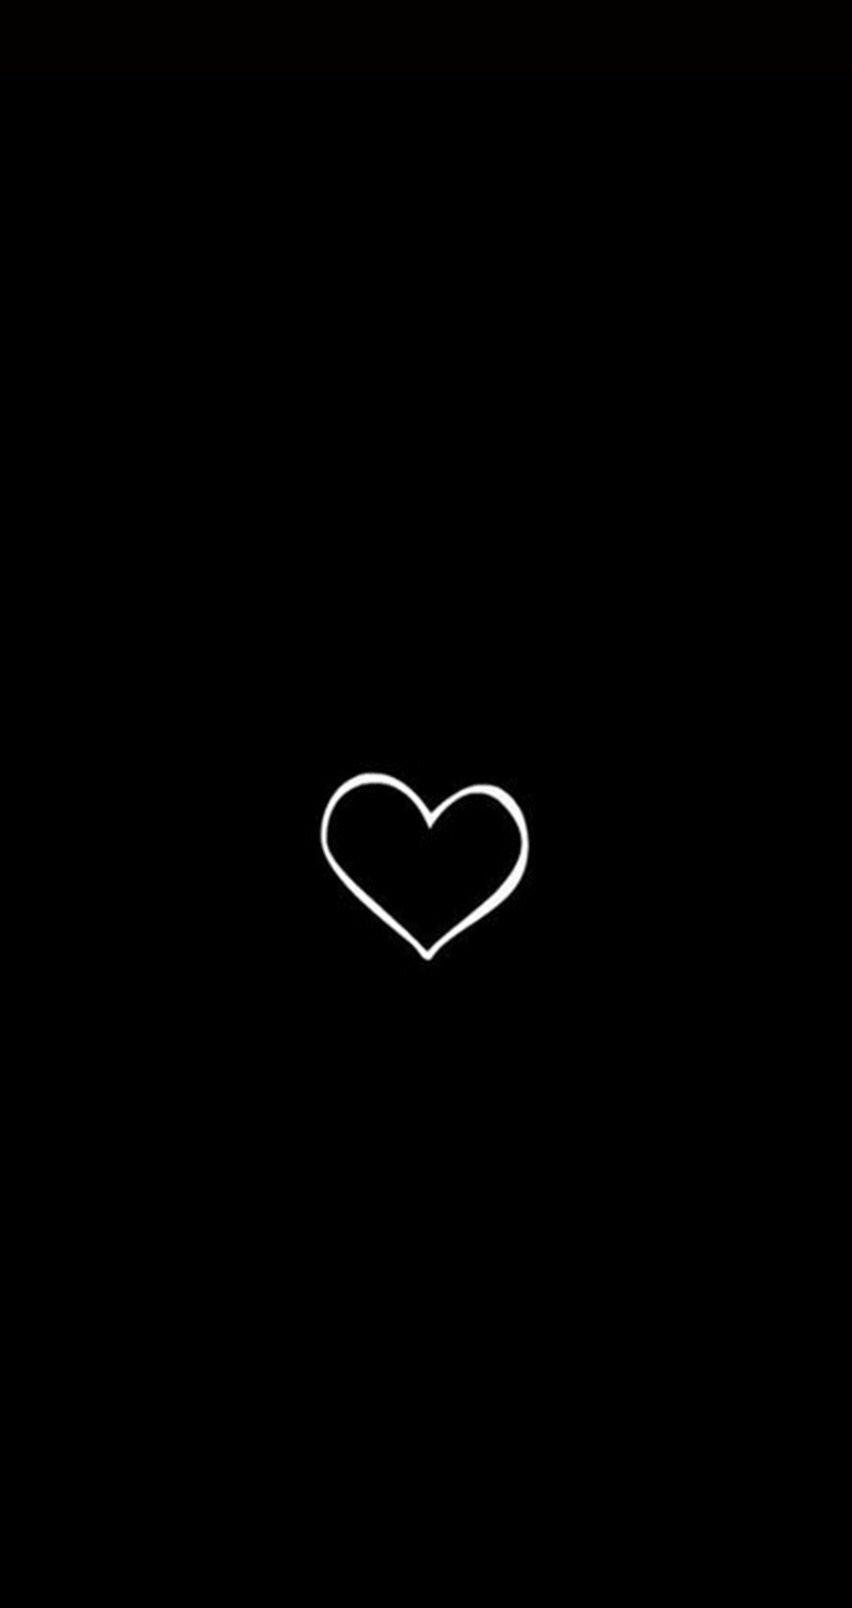 Heart Sentimientos Unicos Wallpaper Pinterest Iphone